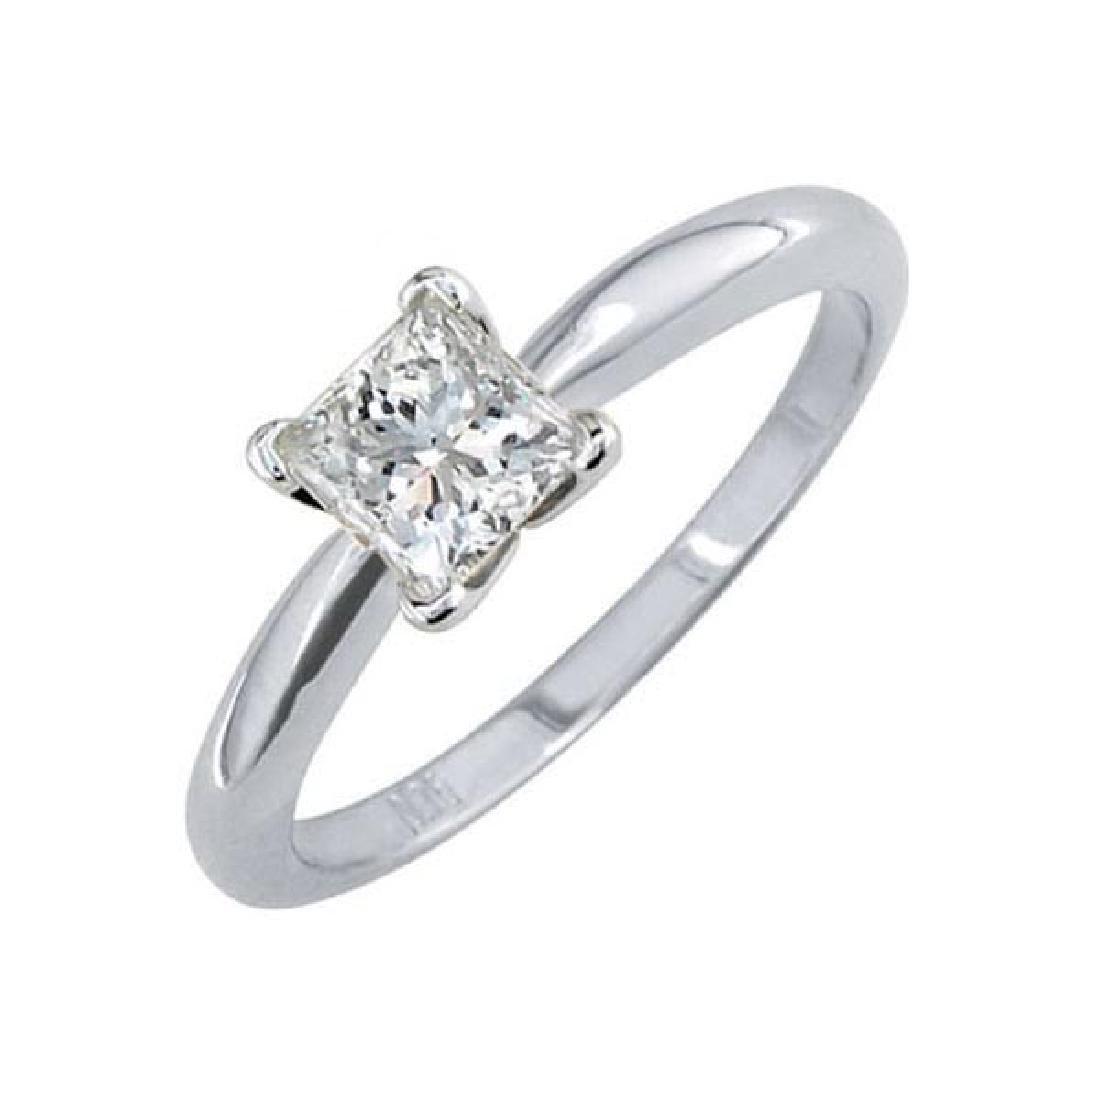 Certified 1.01 CTW Princess Diamond Solitaire 14k Ring